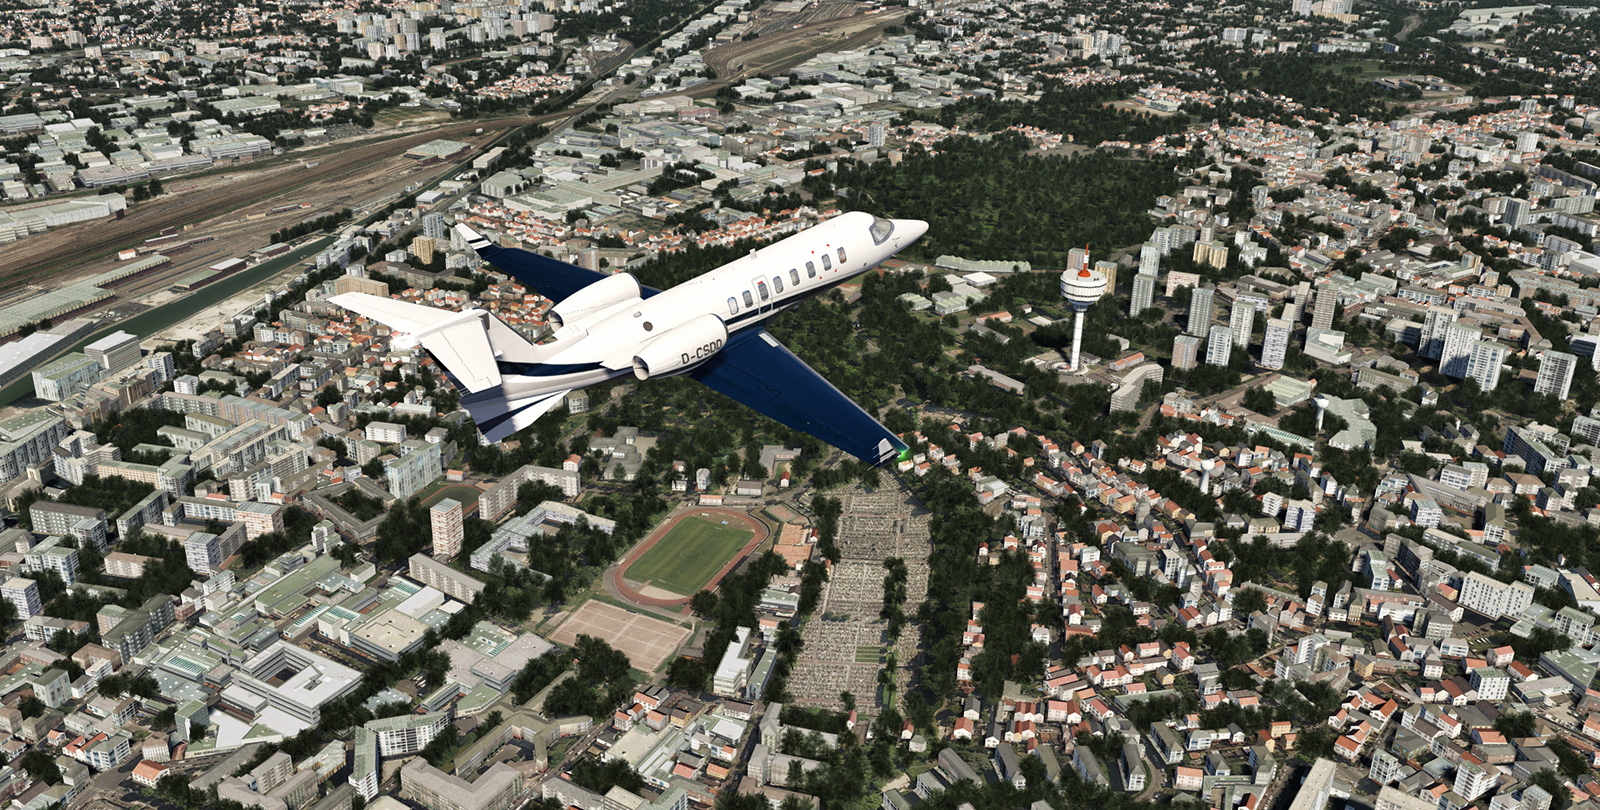 aerofly_fs_2_screenshot_10_20200215-2033